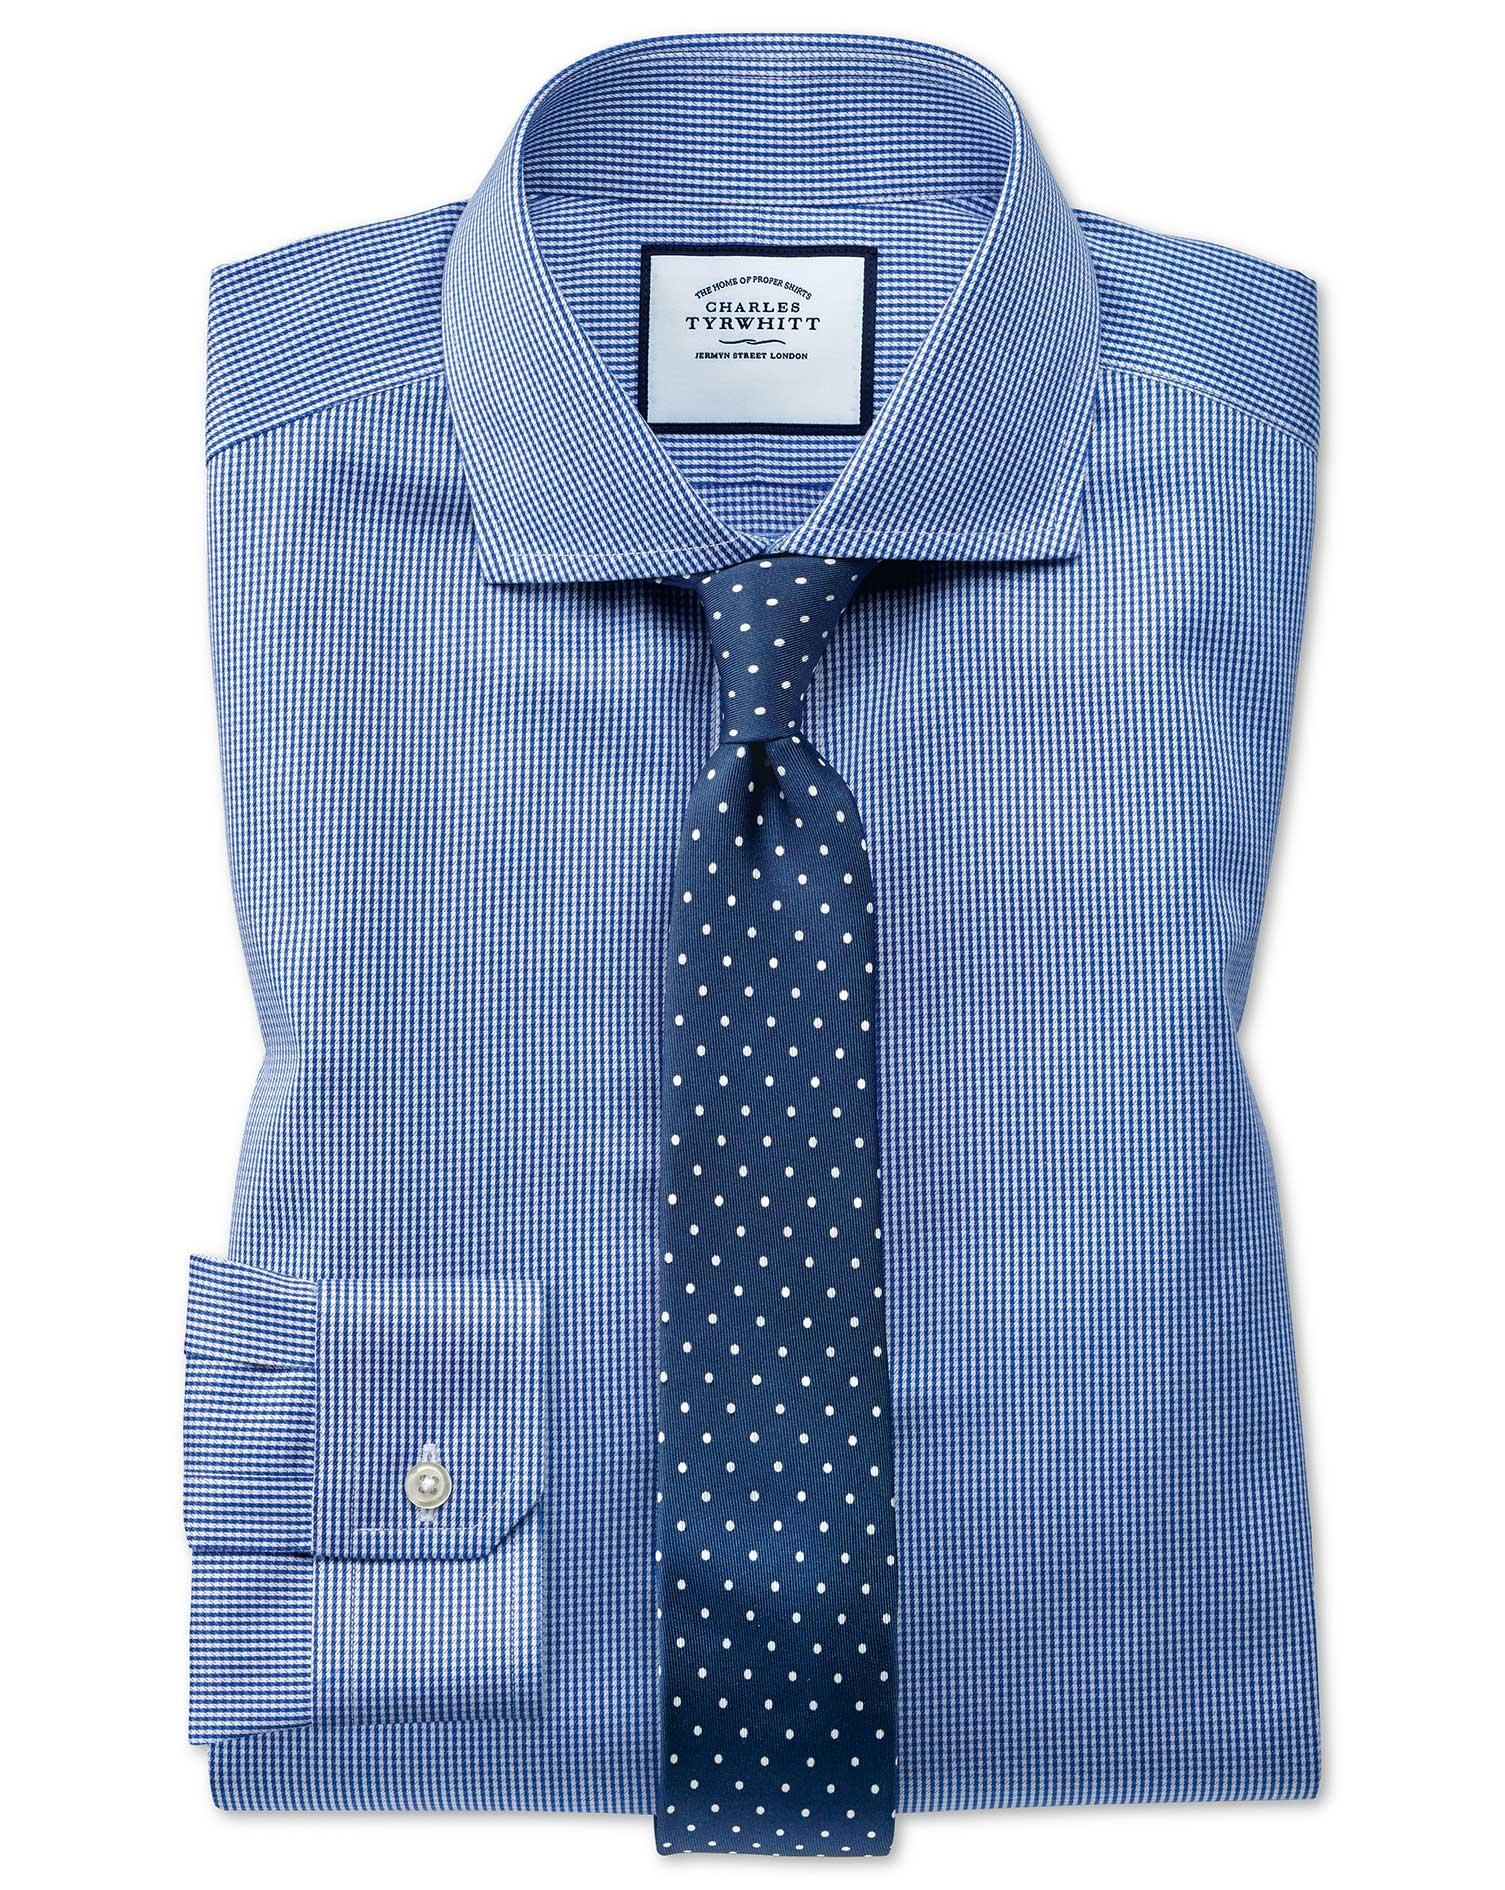 Super Slim Fit Cutaway Non-Iron Puppytooth Royal Blue Cotton Formal Shirt Single Cuff Size 15.5/36 b